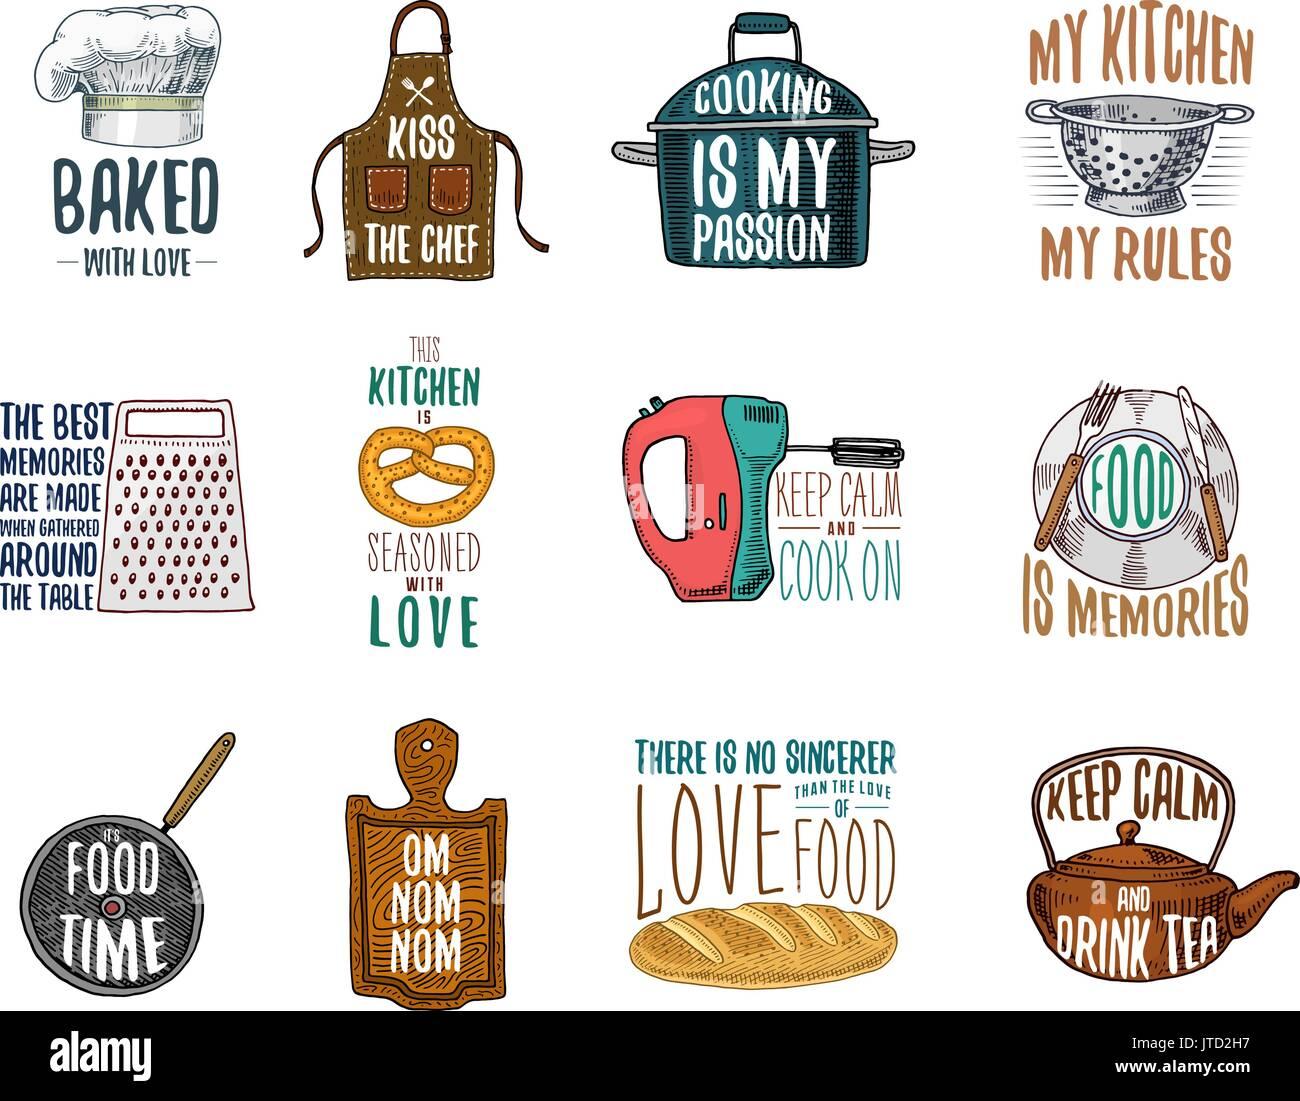 Kochtopf Material schürze und kochtopf bagel und holzbrett mit kapuze backen oder